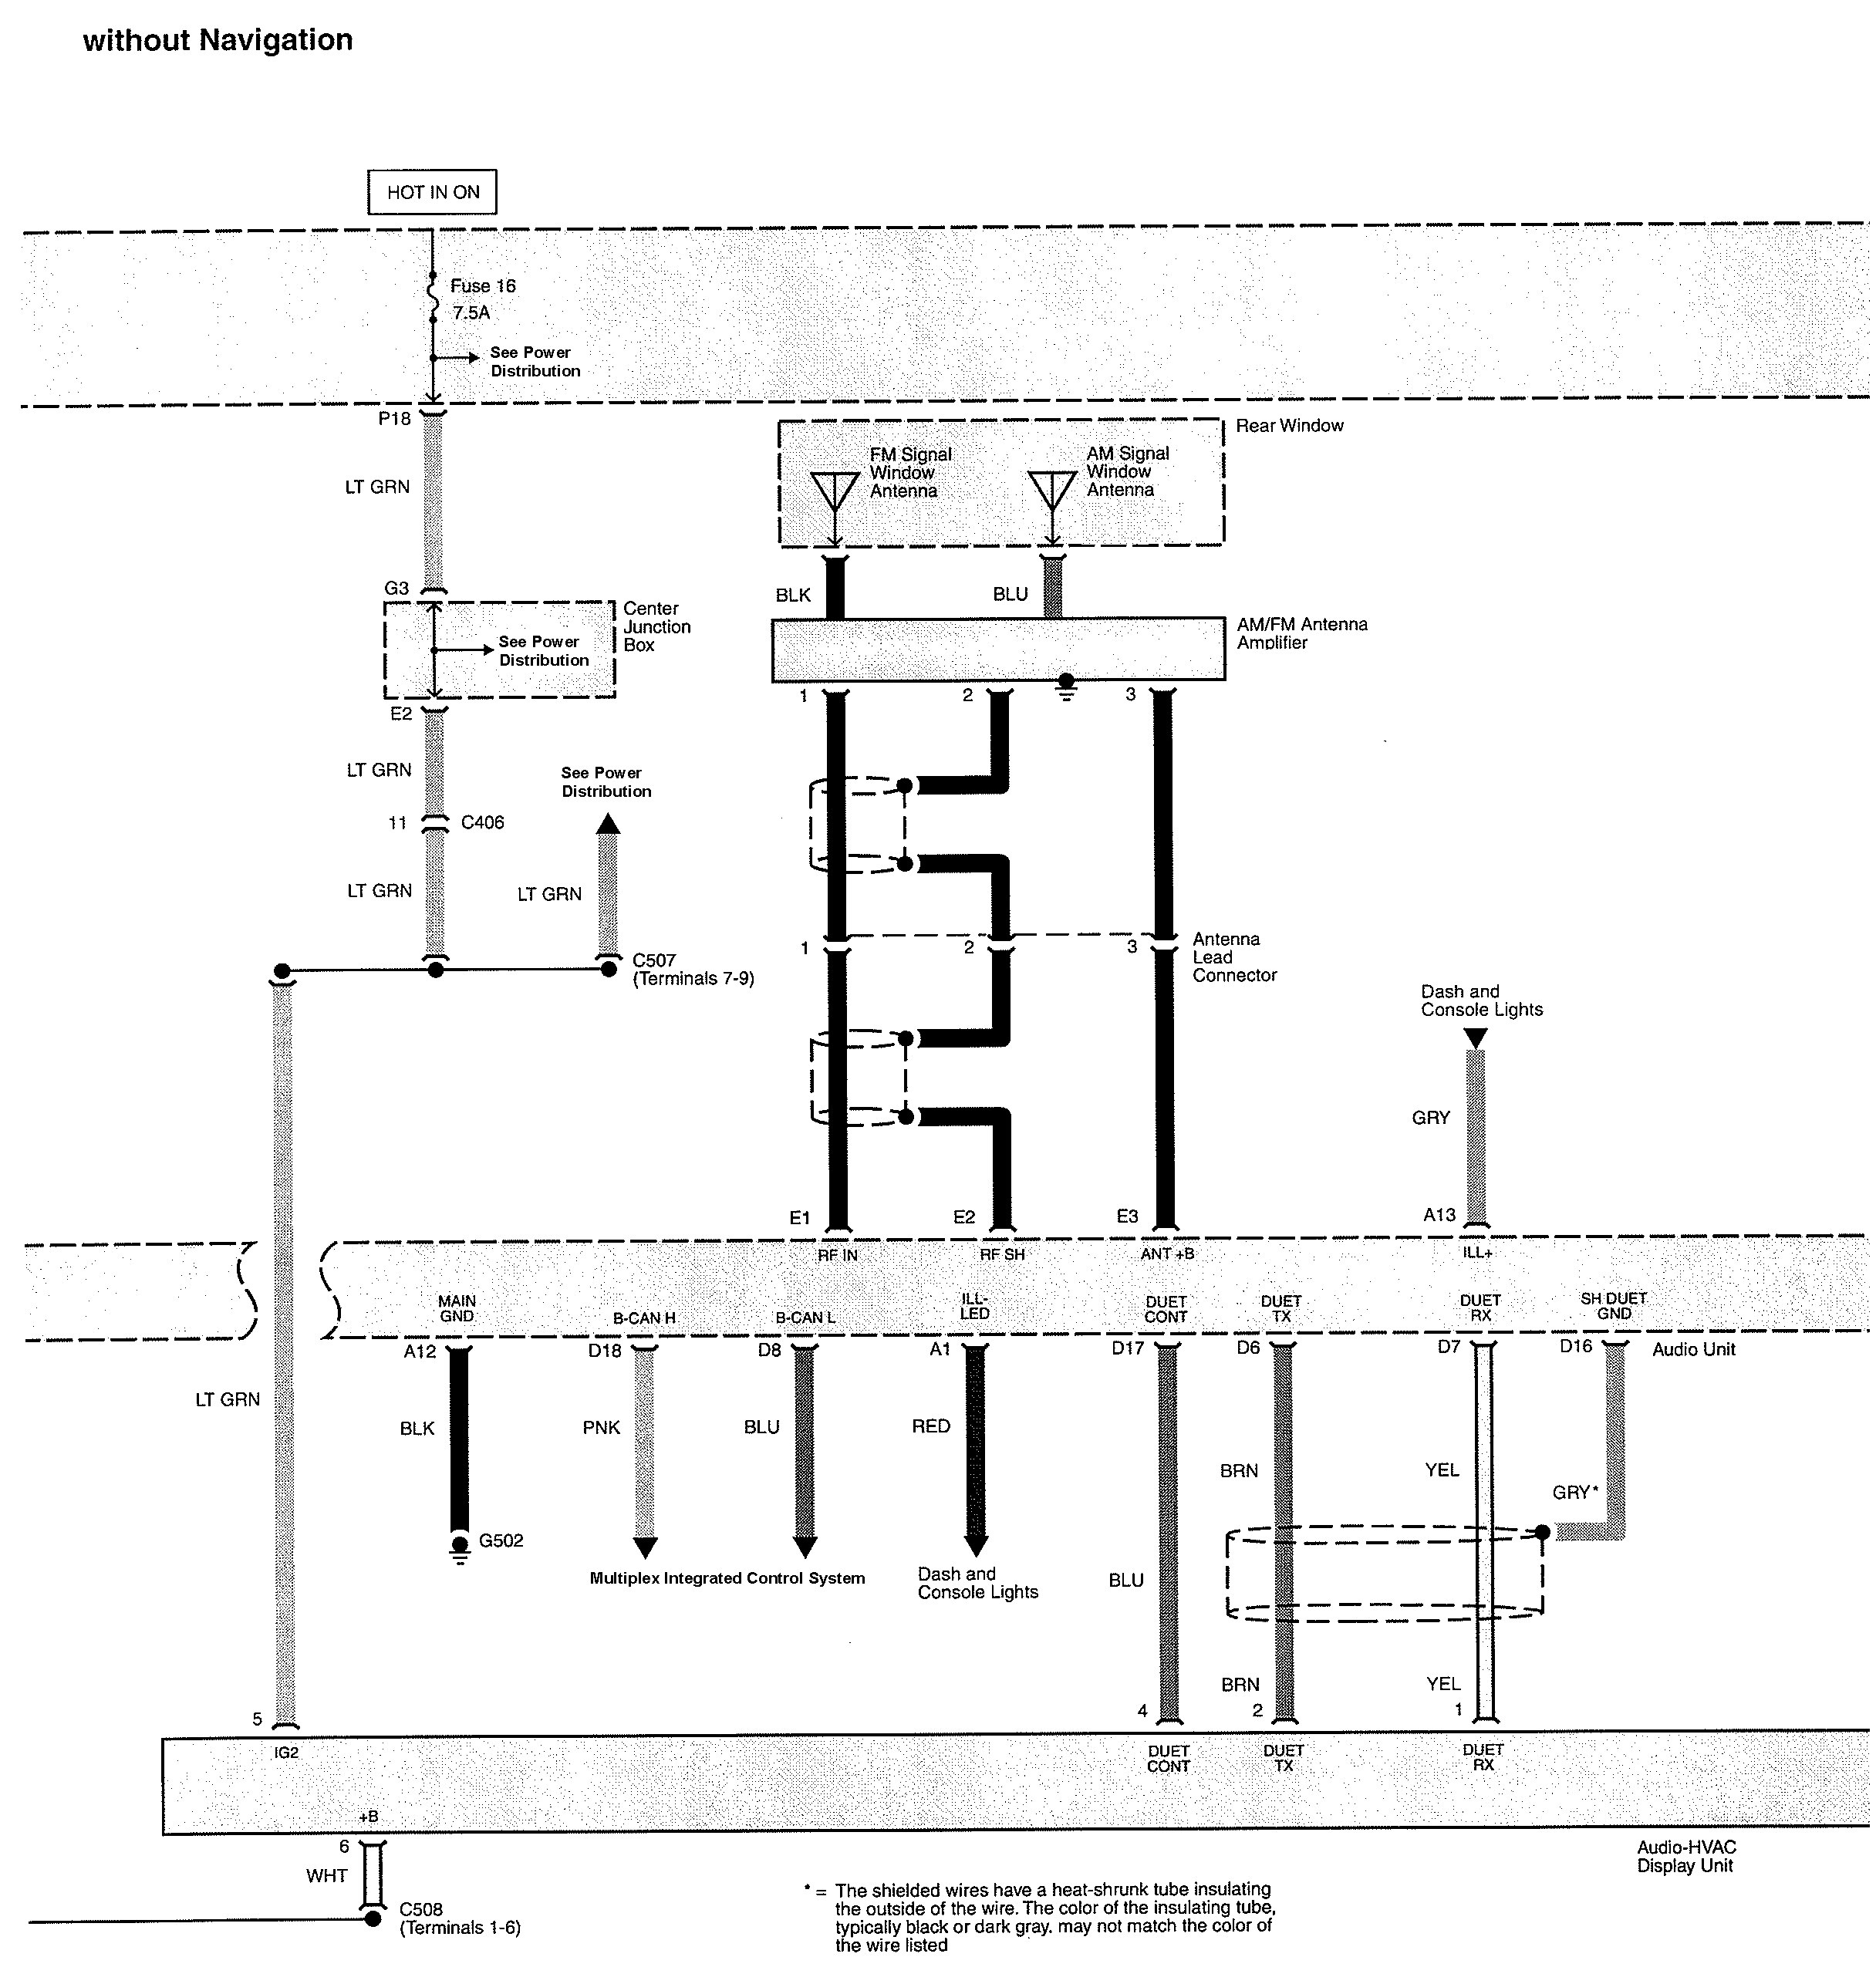 Acura Tl 2010 Wiring Diagrams Audio Carknowledge Diagram Part 1 2